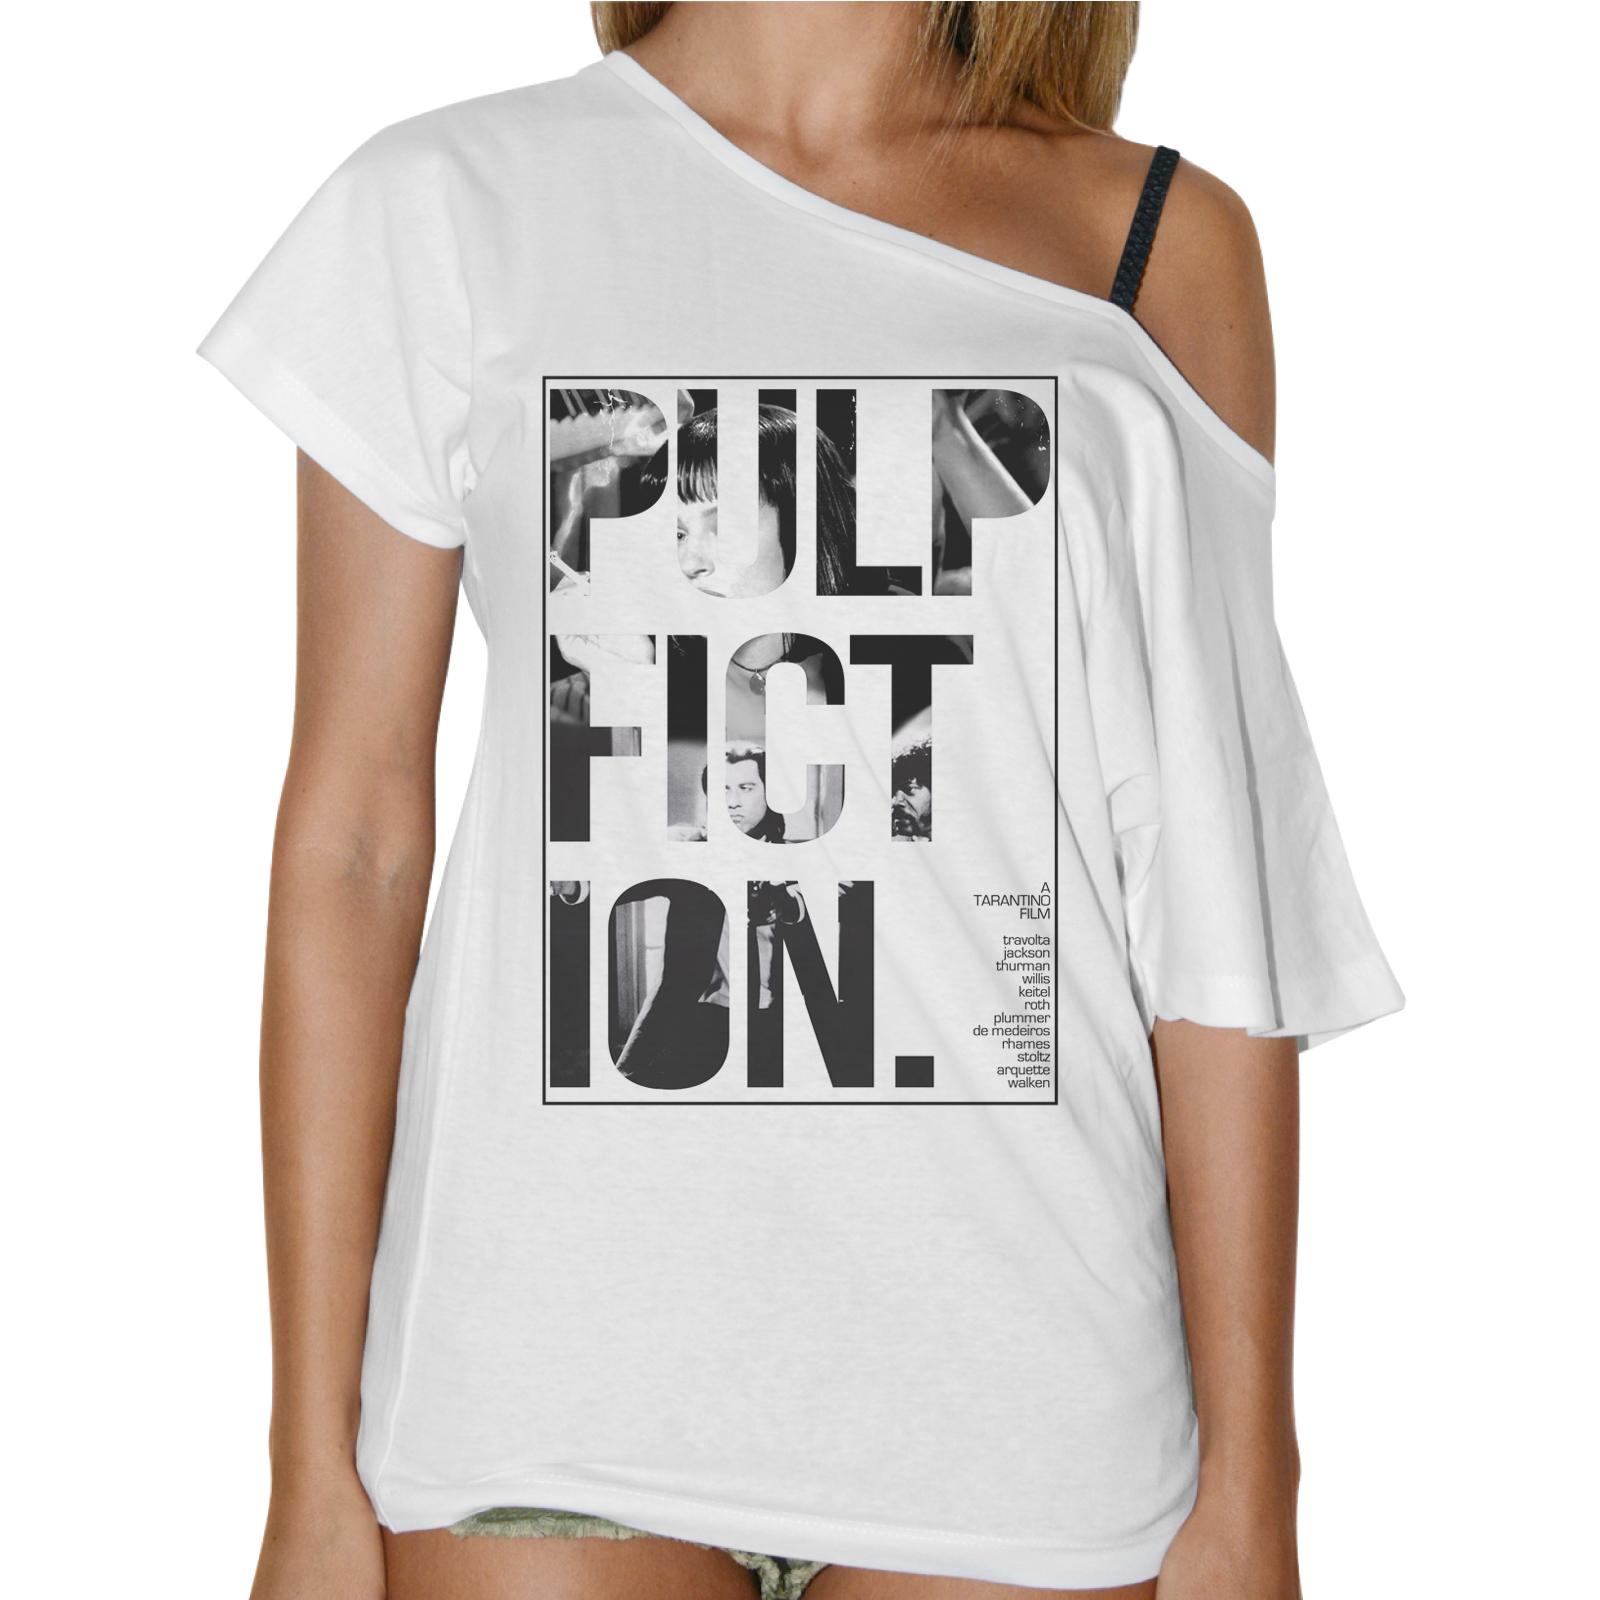 T-Shirt Donna Collo Barca PULP FICTION 1